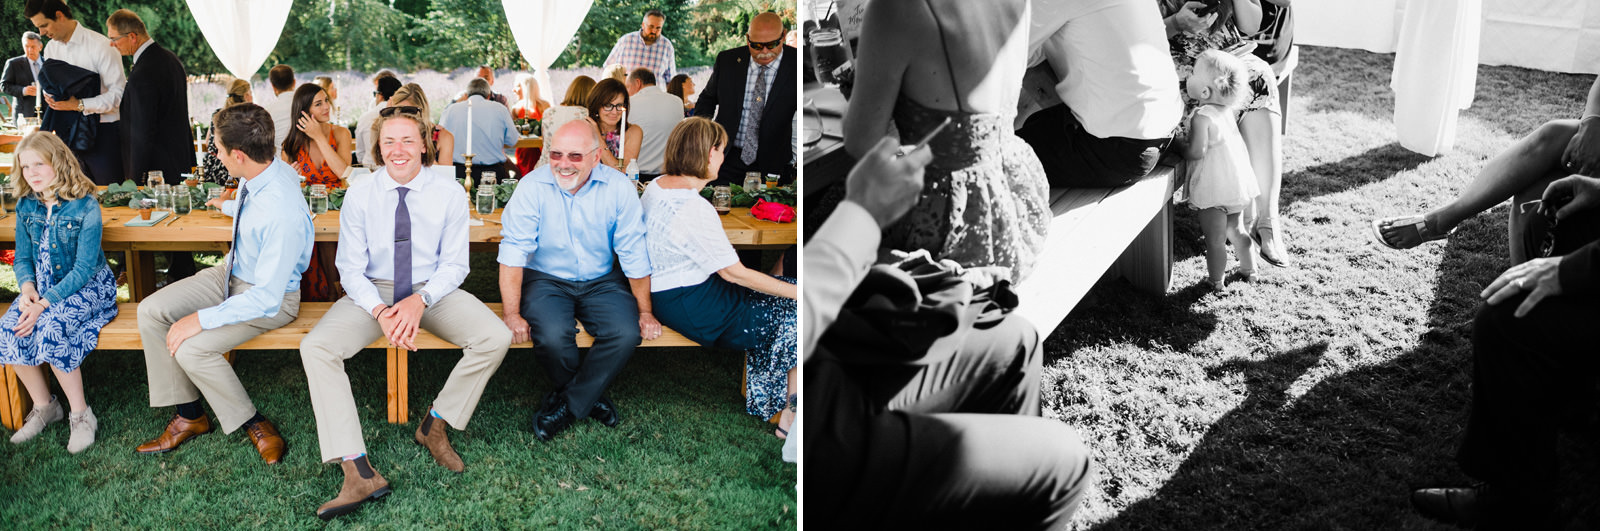 057-woodinville-lavendar-farm-wedding-with-golden-glowy-photos.jpg